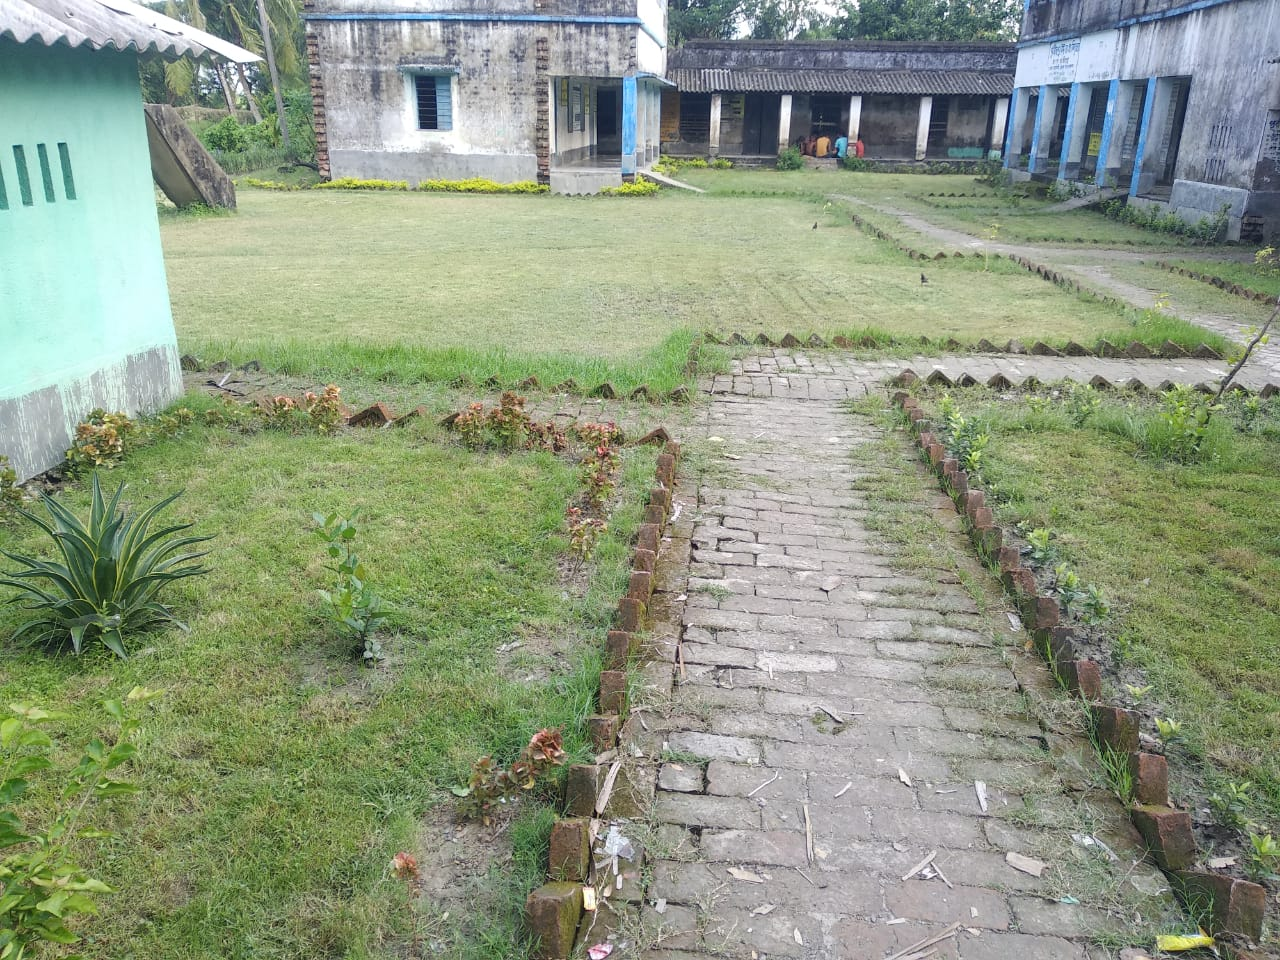 Mukti Beautified The School Compound Of Purba Para F. P School At Mukti Gram